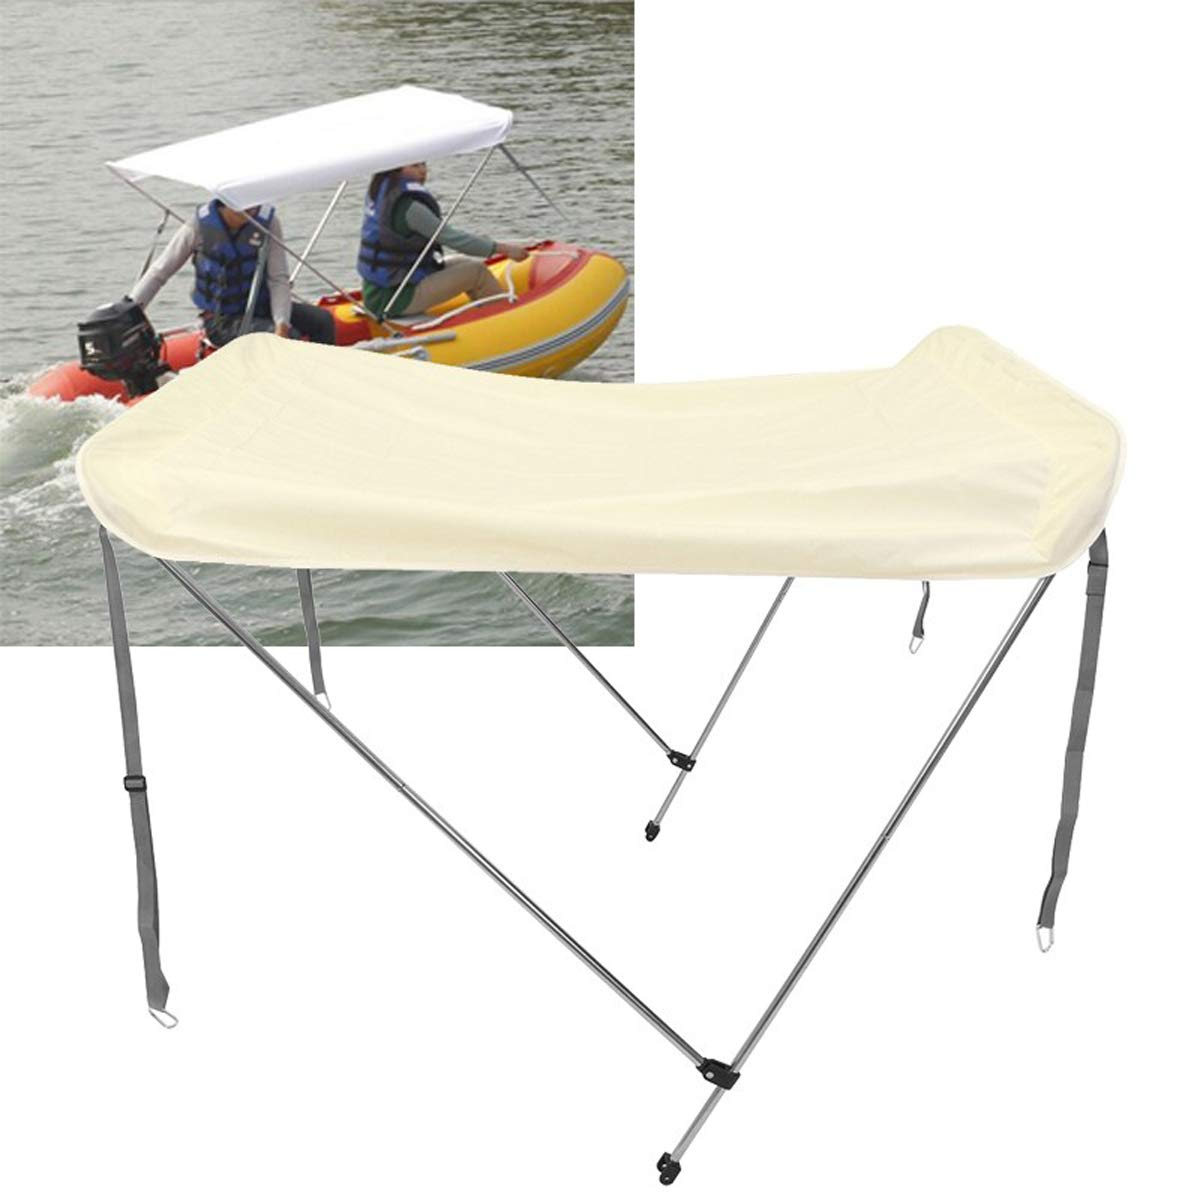 YULPING 2-4人インフレータブルボート折りたたみ式抗UVテントサンシェードオーニングトップカバーテントサンレインシェルター 玩具モデル屋外用品   B07QMHLQY9